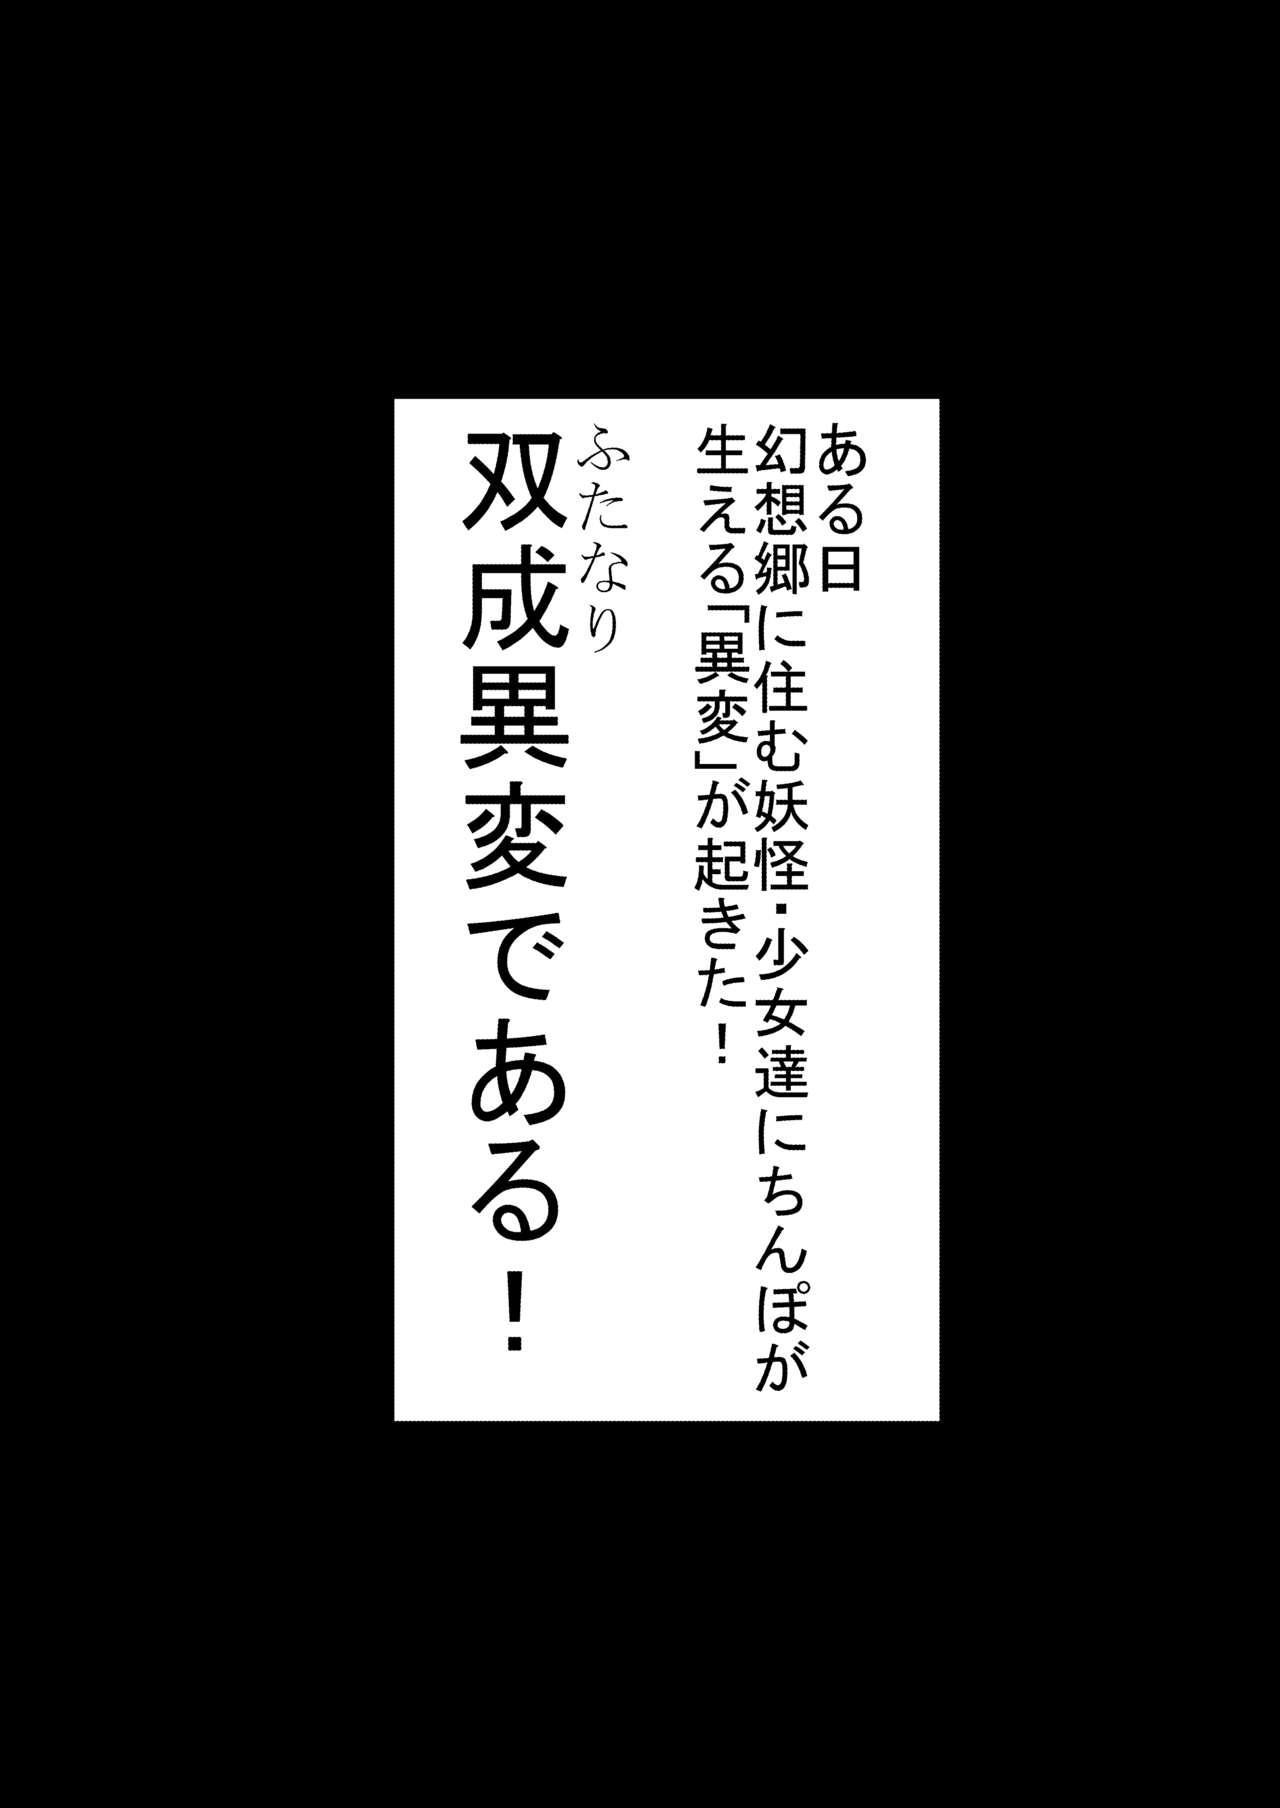 [Black_Sugar(Kari) (Kuroi Megane)] Touhou Futabusa ~Kazami Yuuka~ 2 (Touhou Project) [Digital] 1